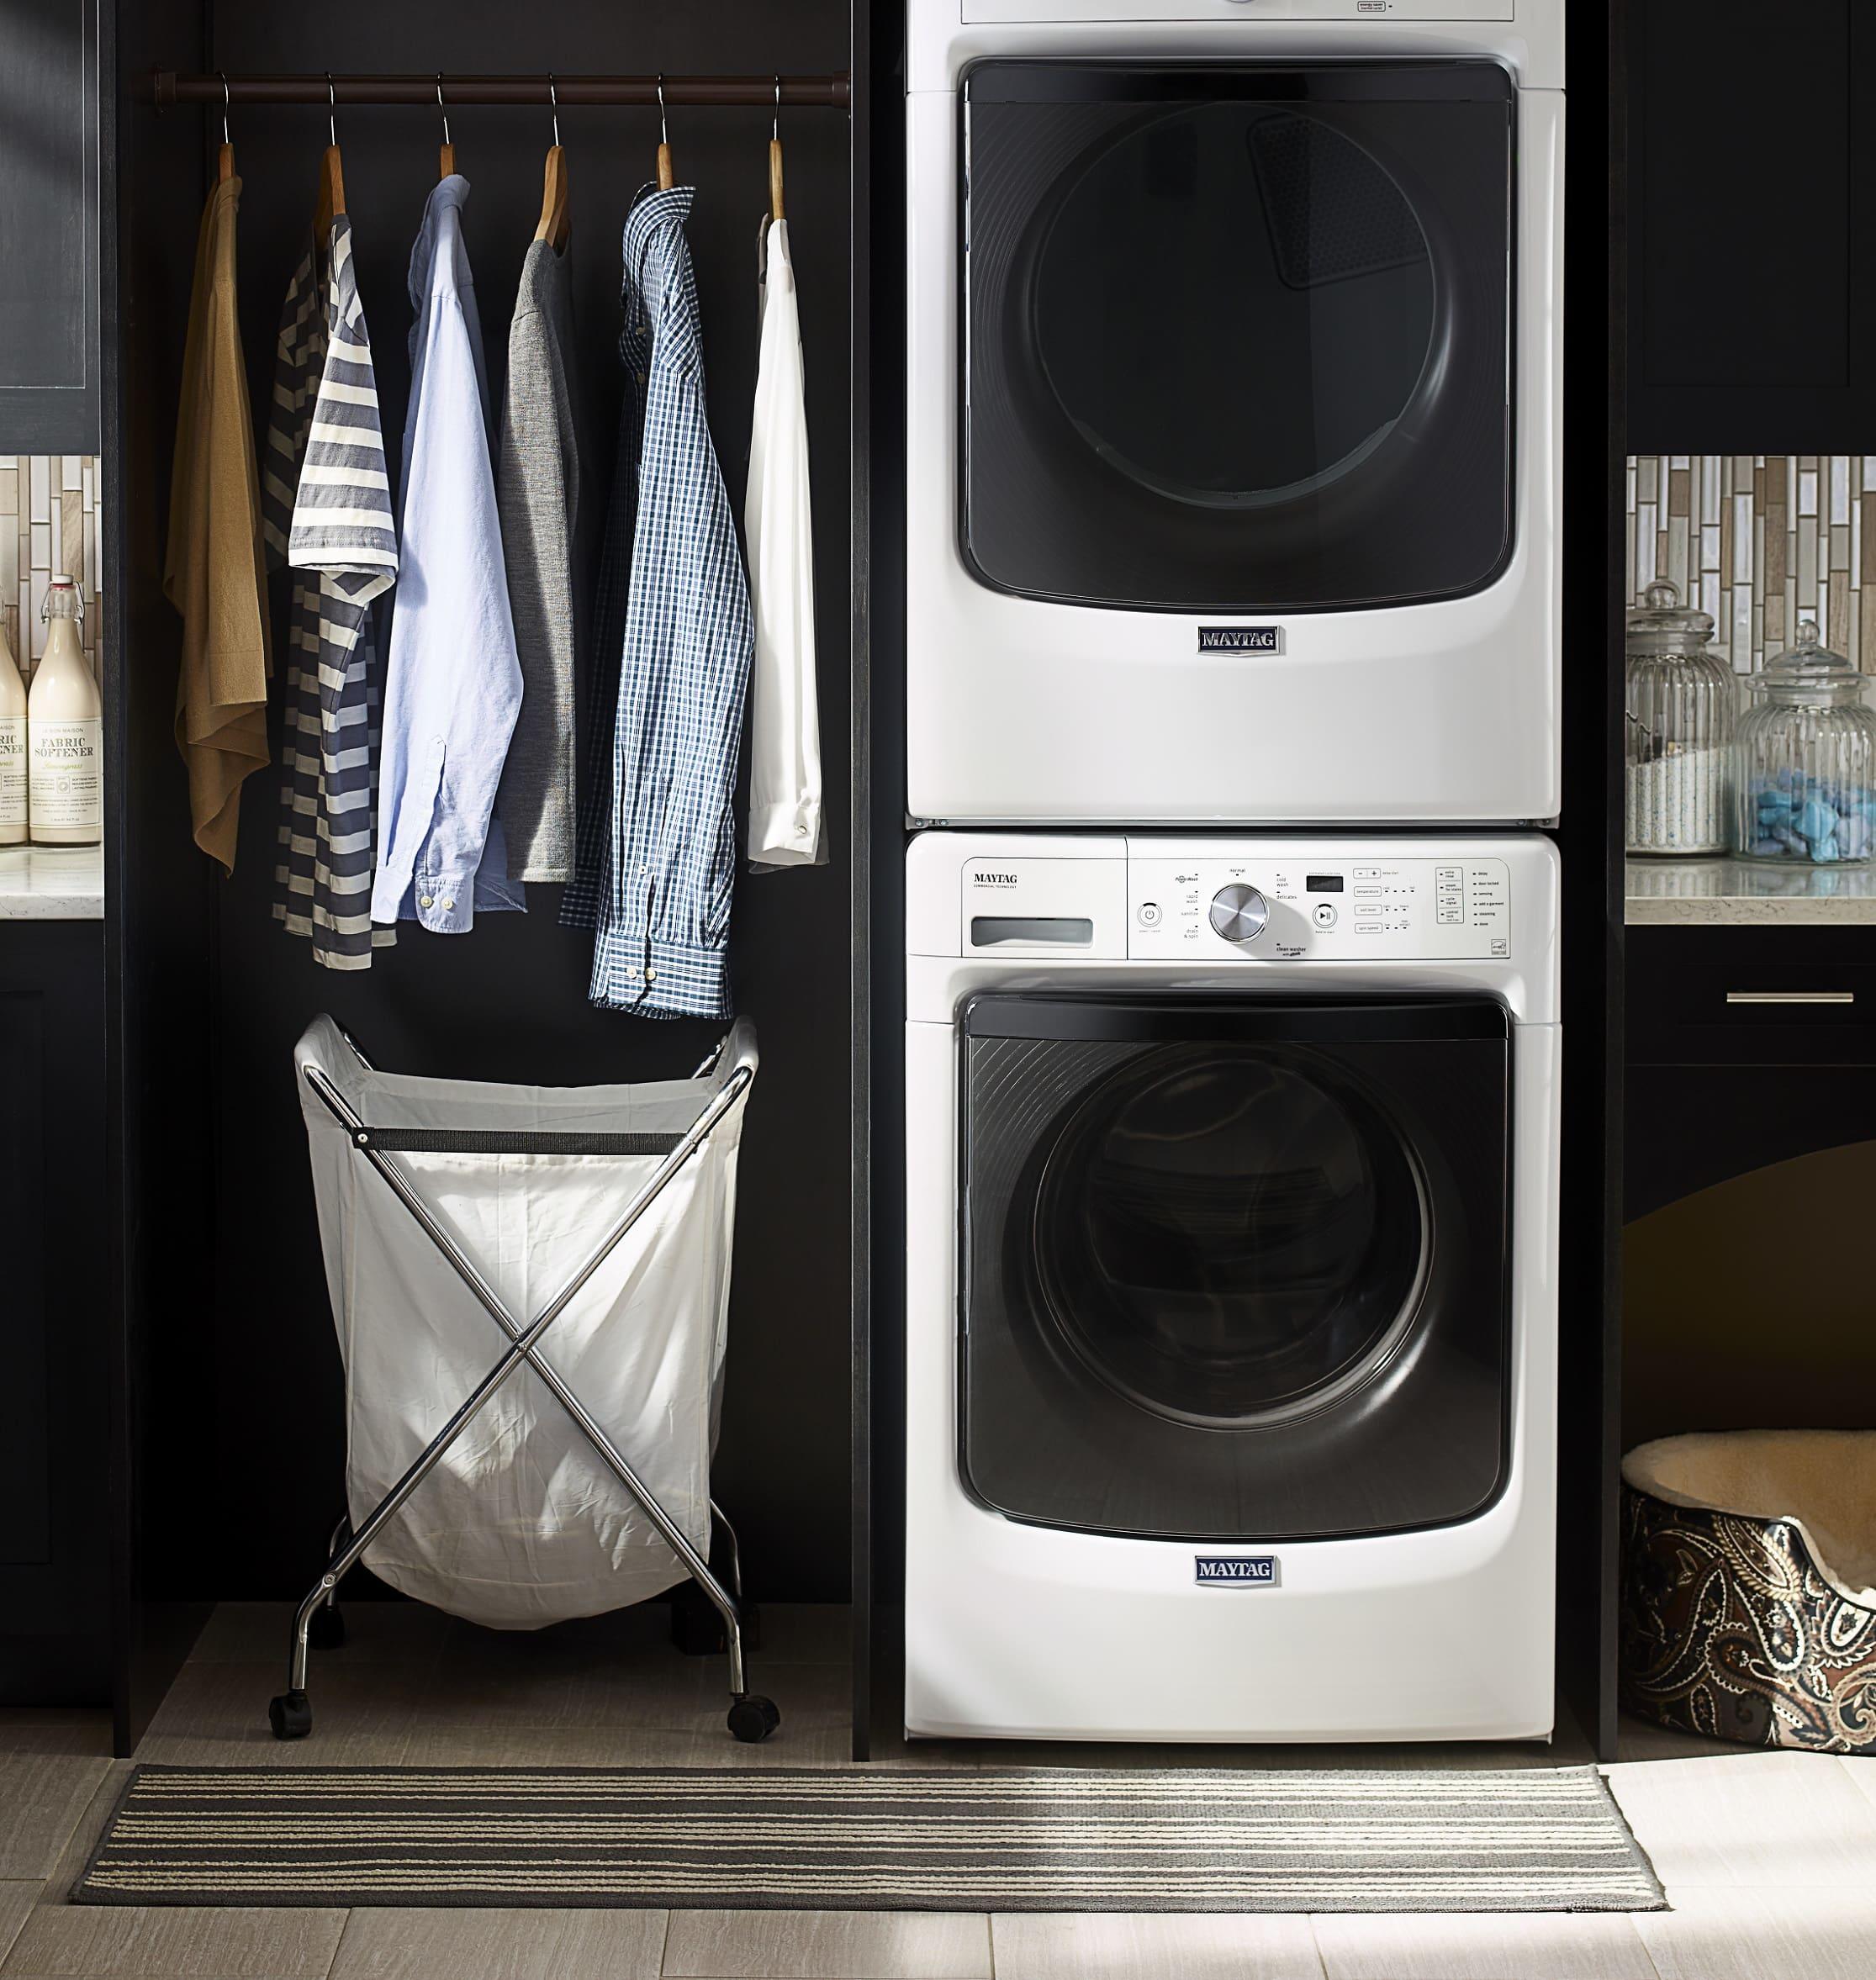 Maytag 3505 Laundry Pair